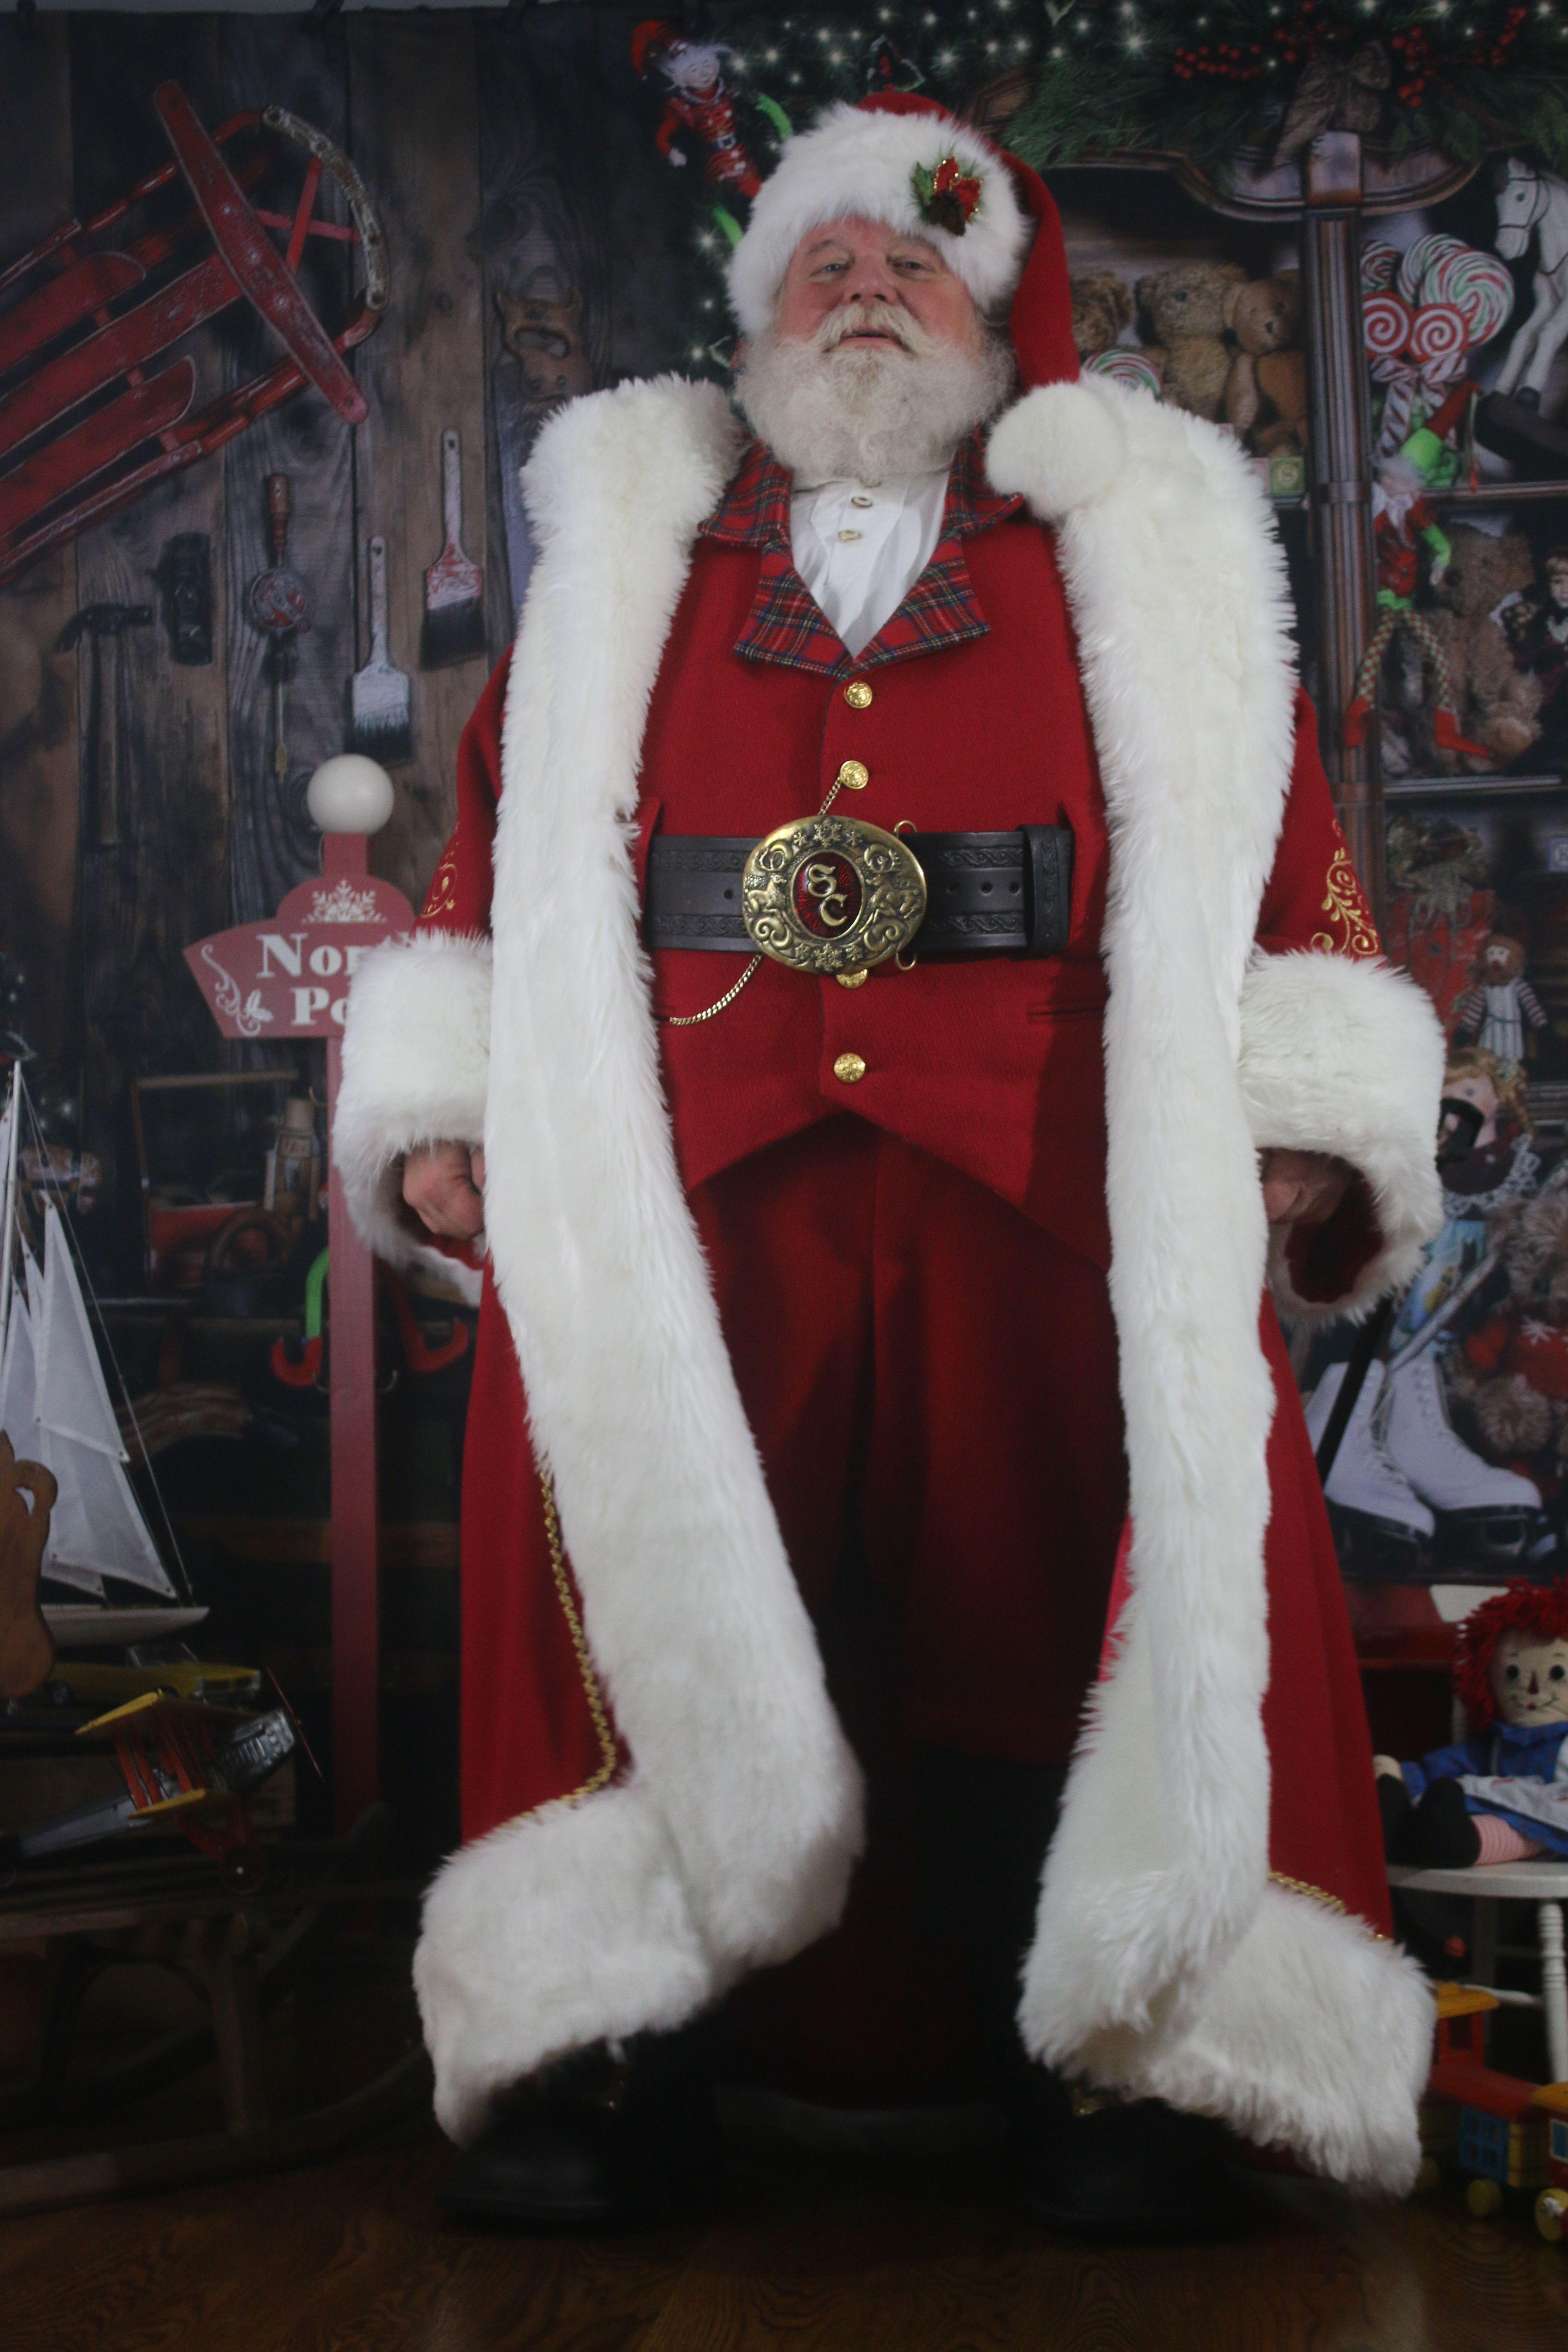 Santa Suites Santa Claus Costume Santa Claus Suit Santa Suits